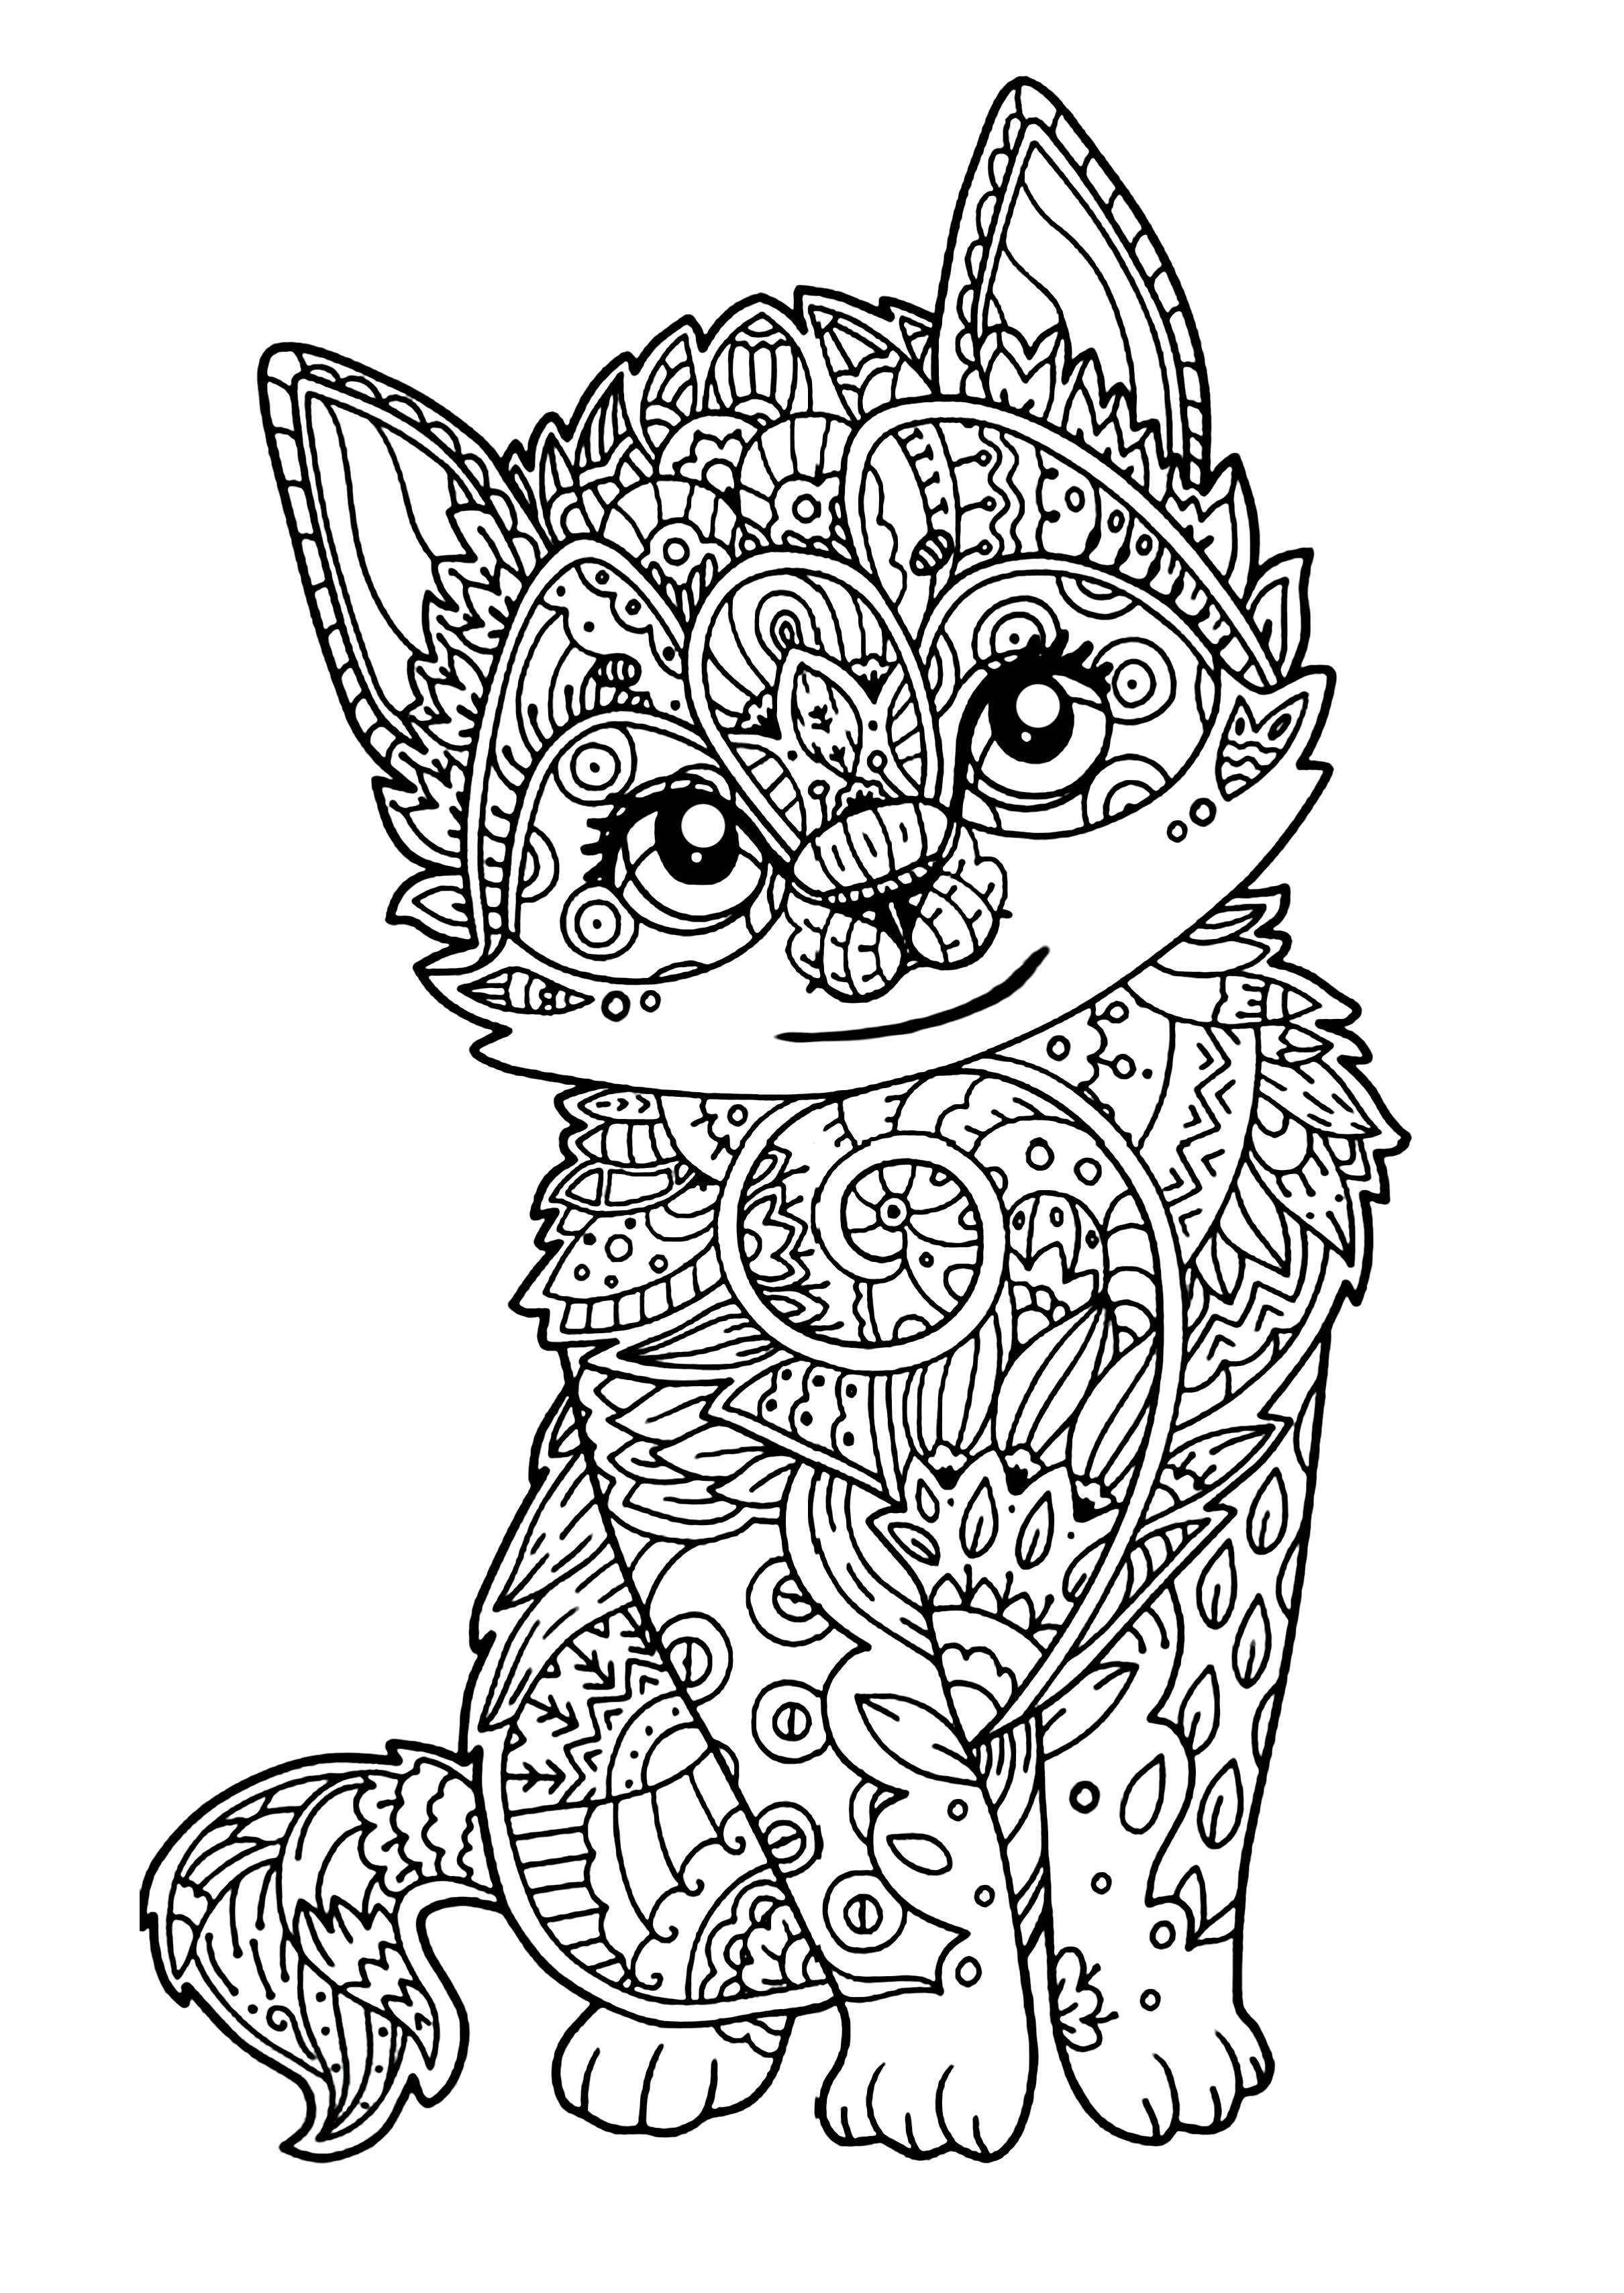 mignon chaton animaux coloriages difficiles pour adultes justcolor. Black Bedroom Furniture Sets. Home Design Ideas